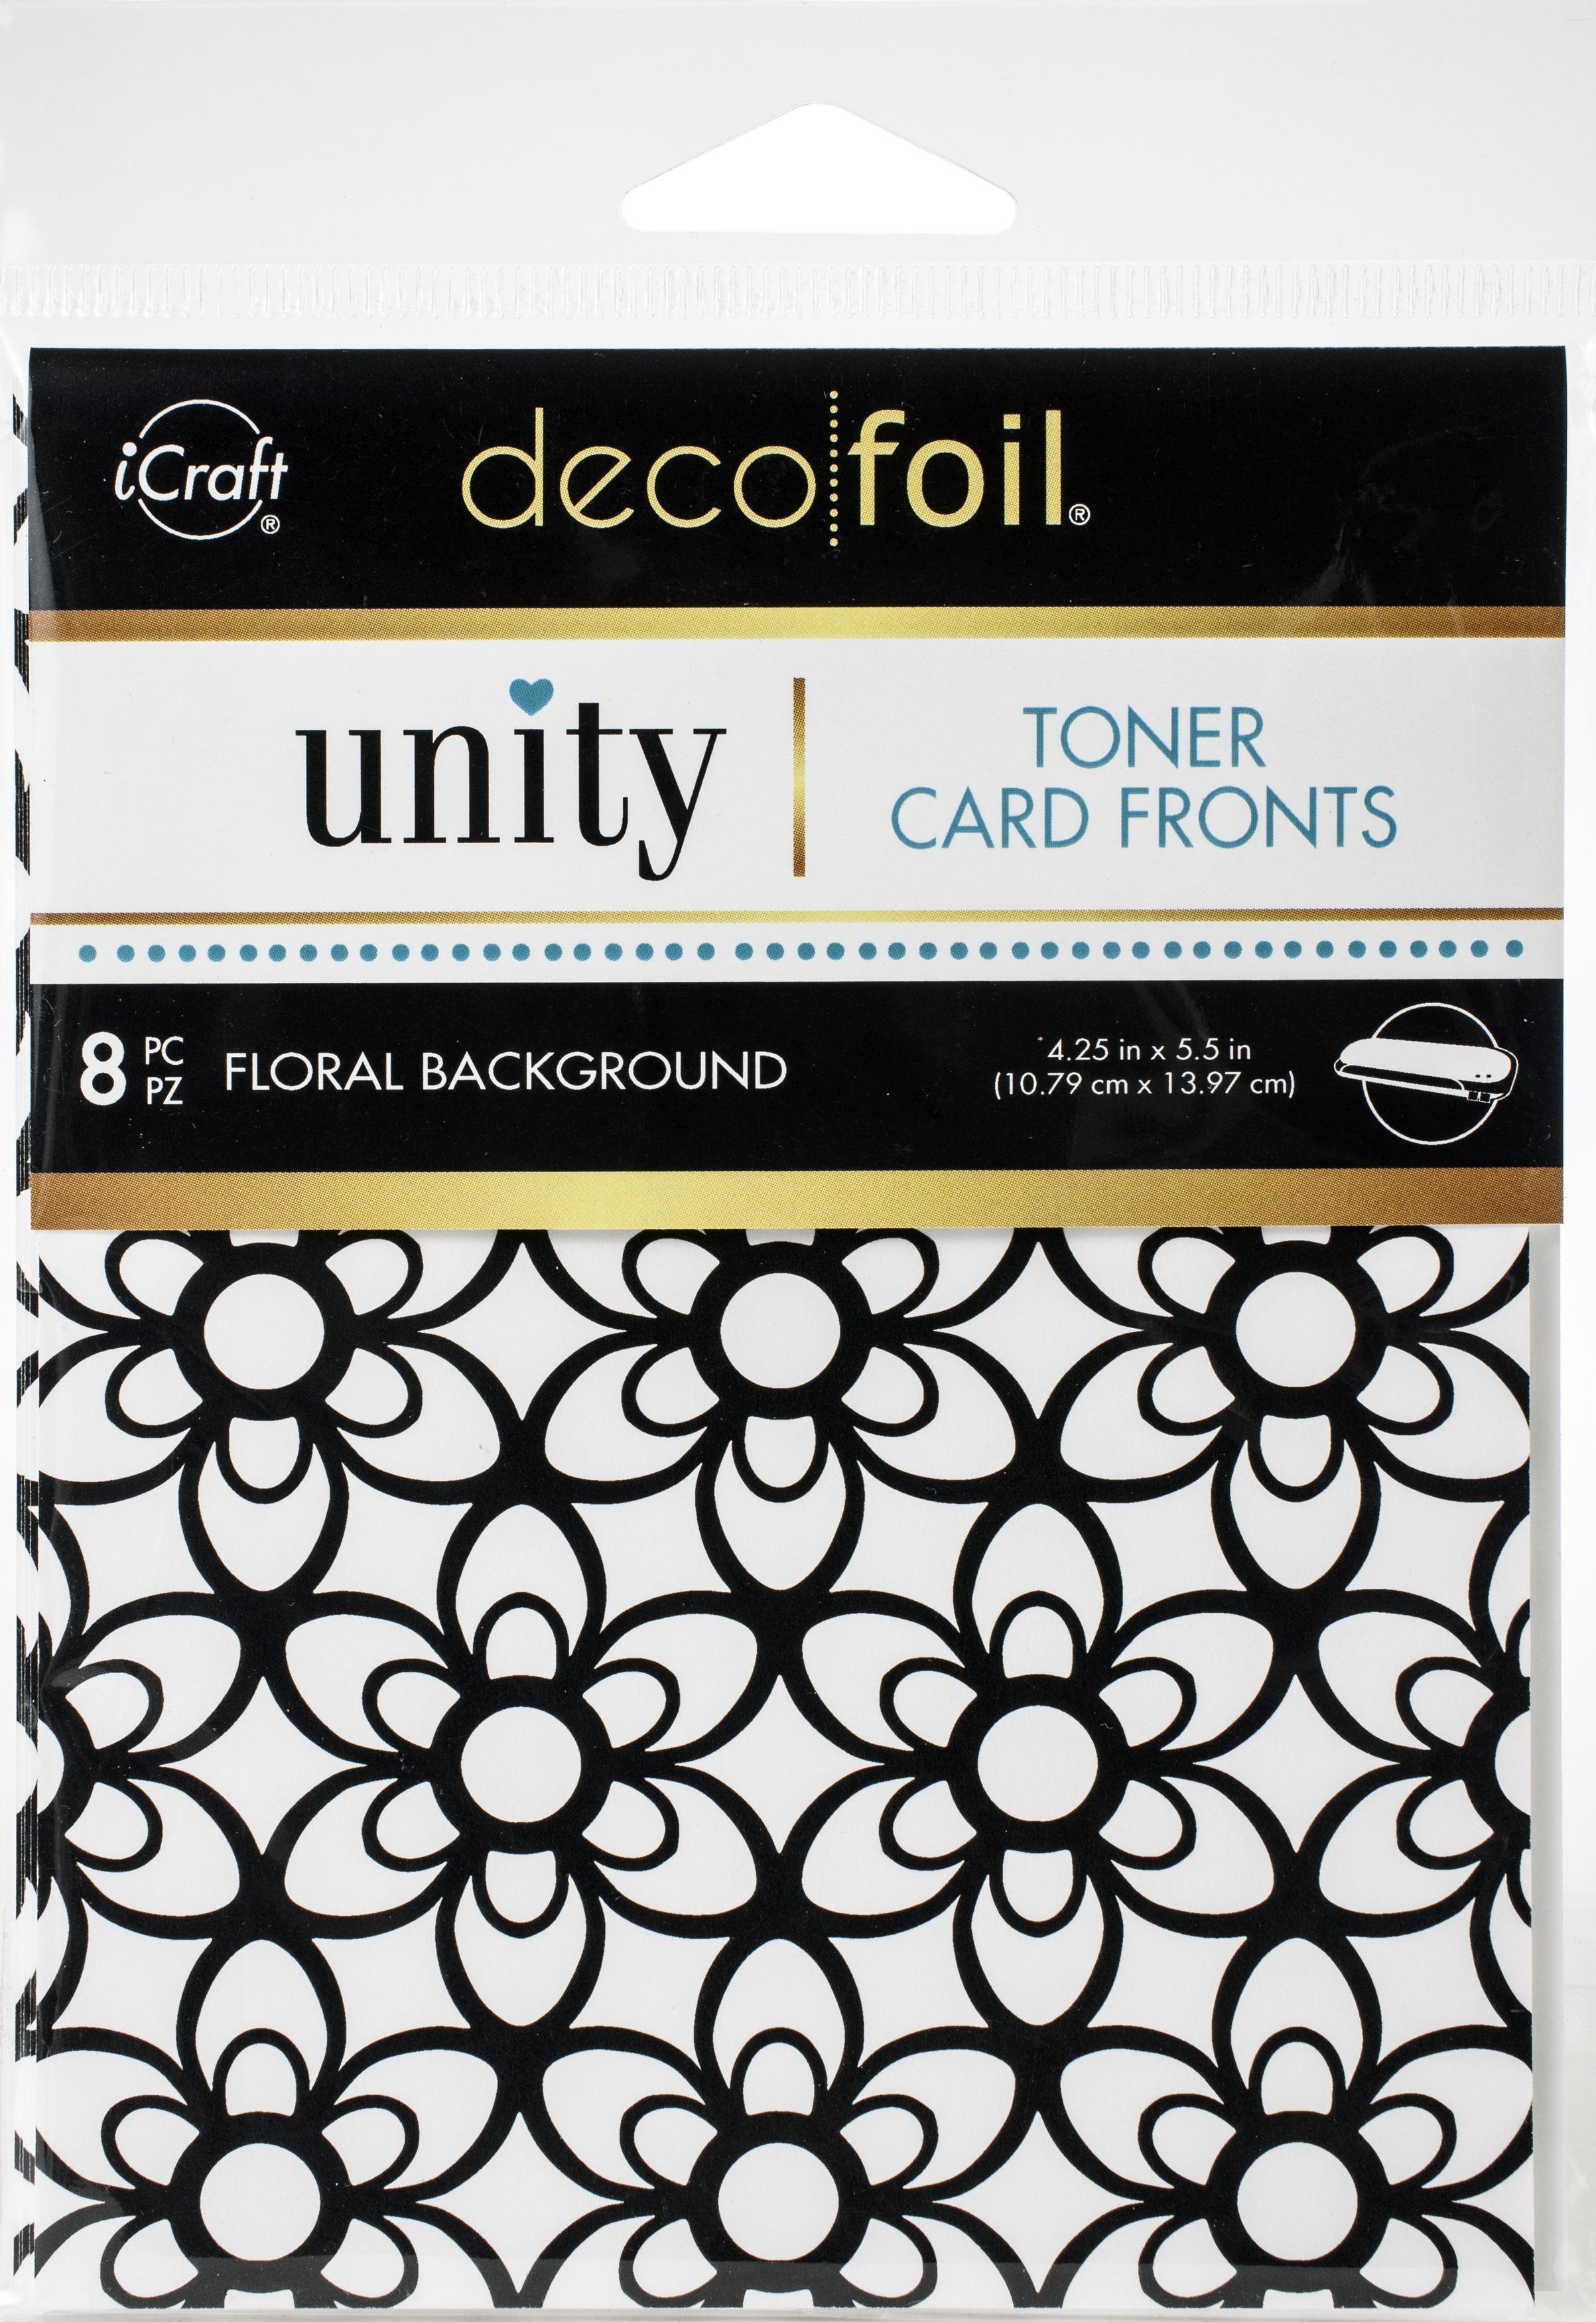 Deco Foil Toner Card Fronts By Unity 4.25X5.5 8/Pkg-Floral Background